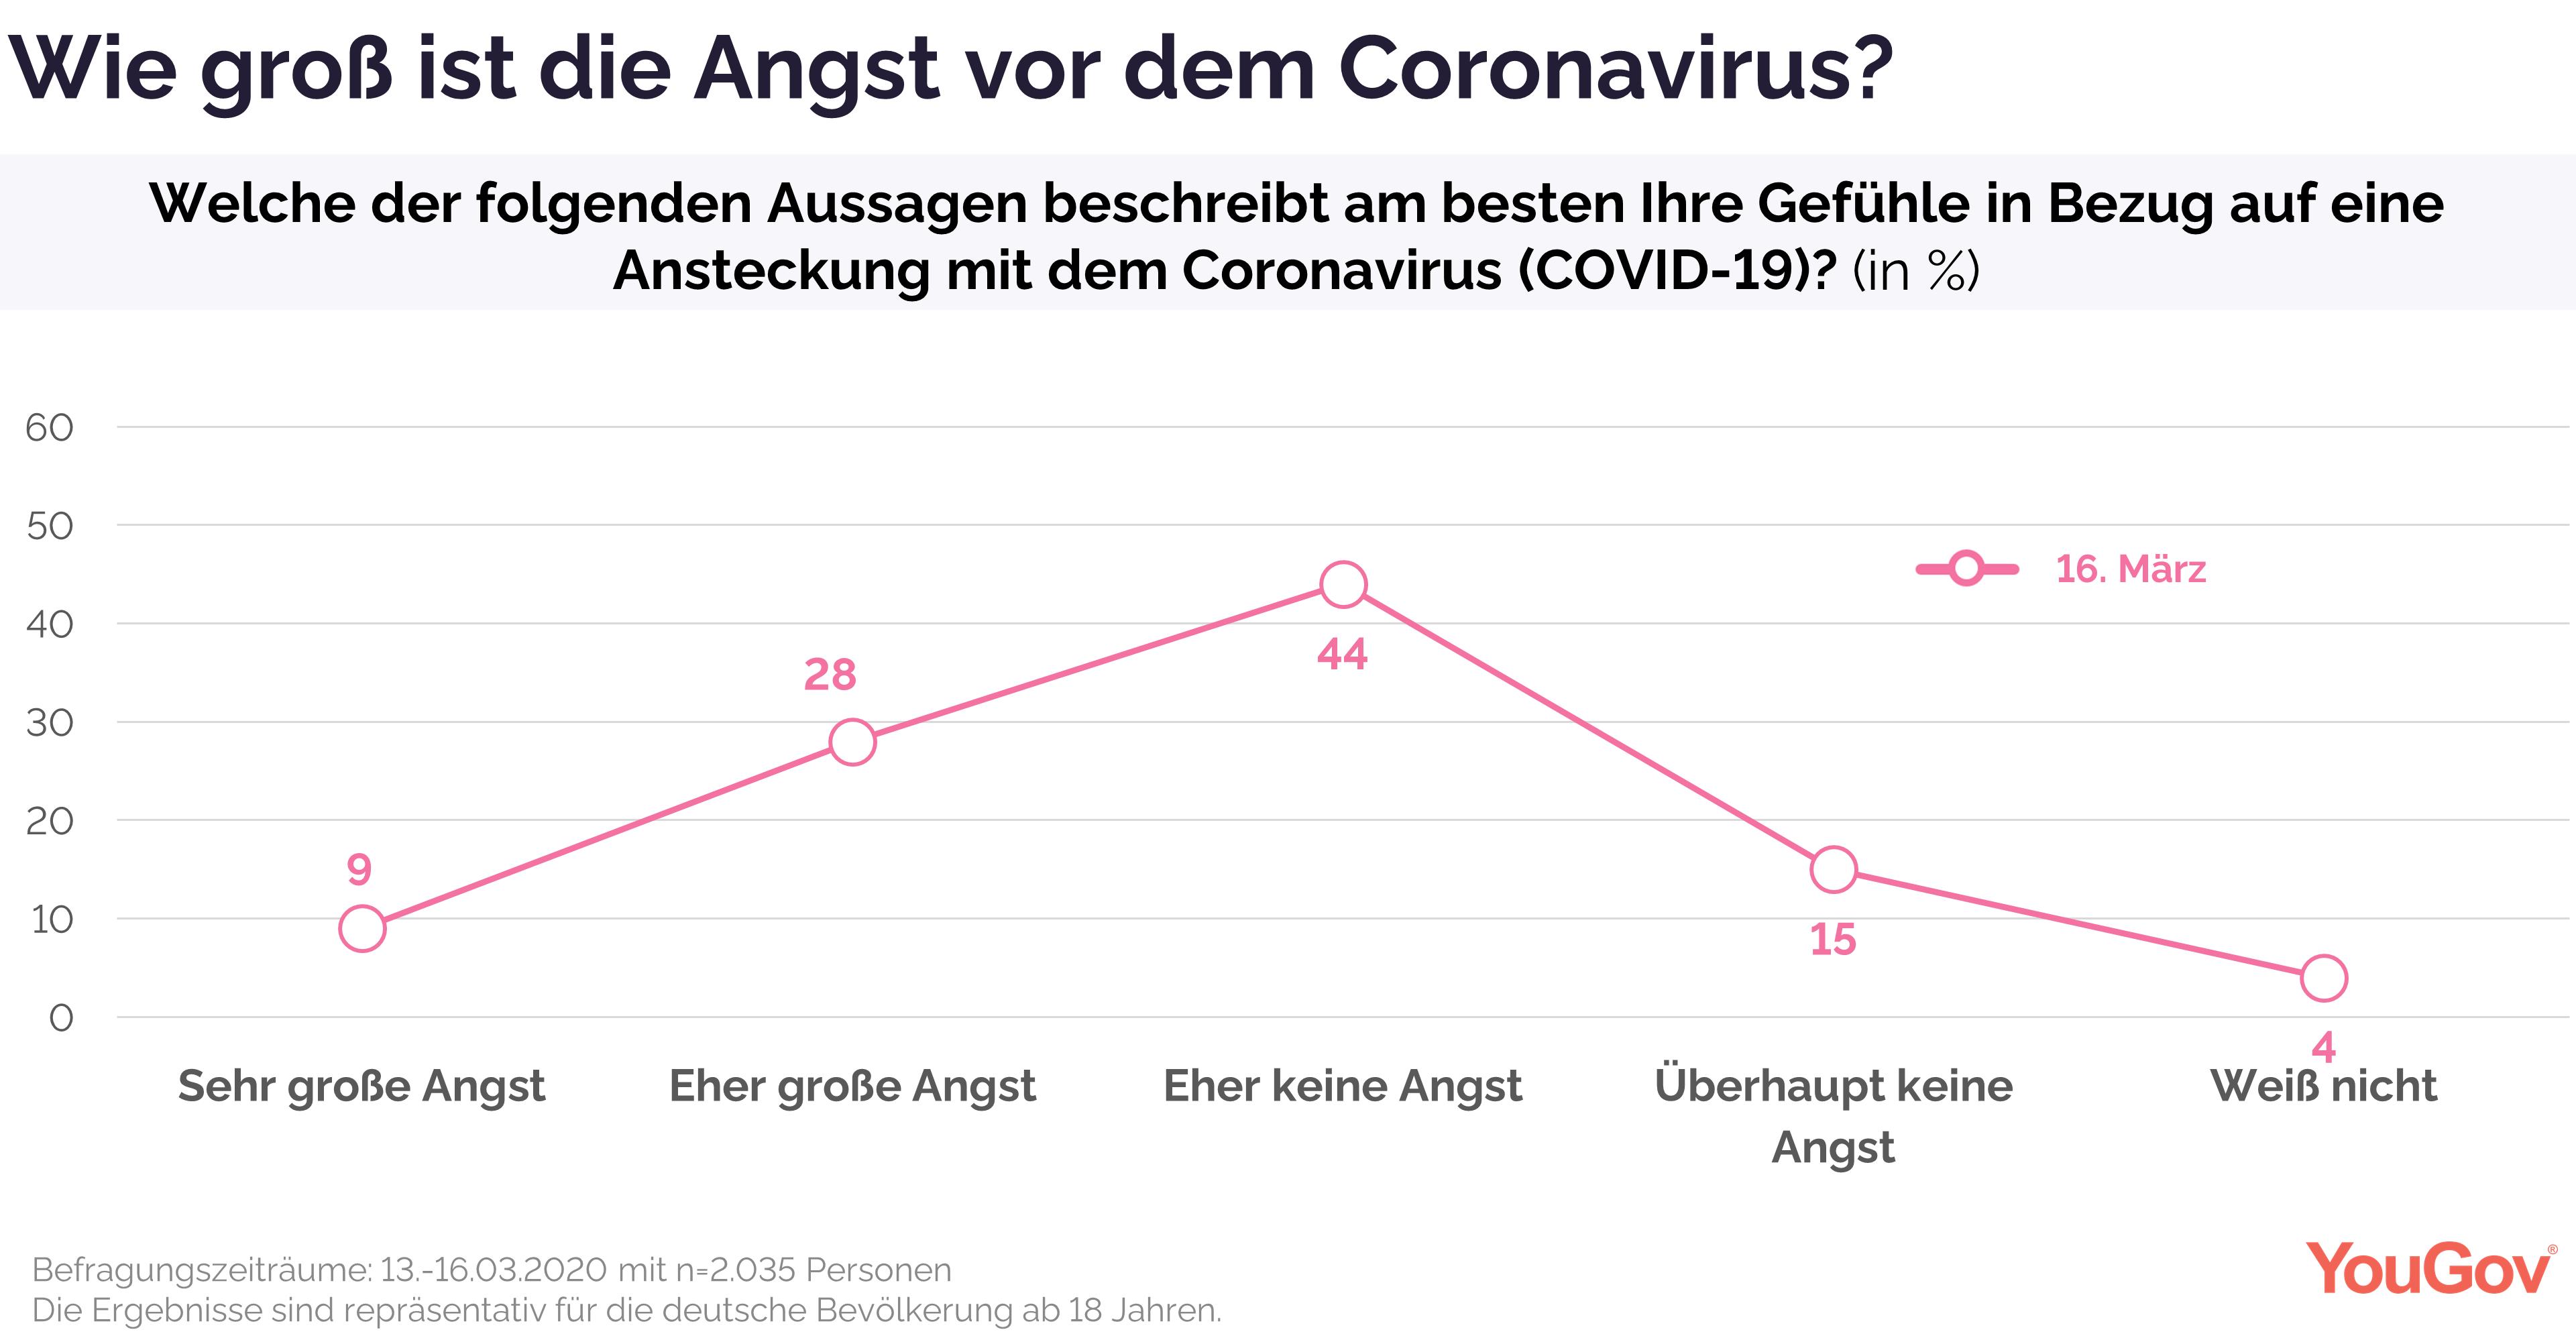 Angst vor dem Coronavirus